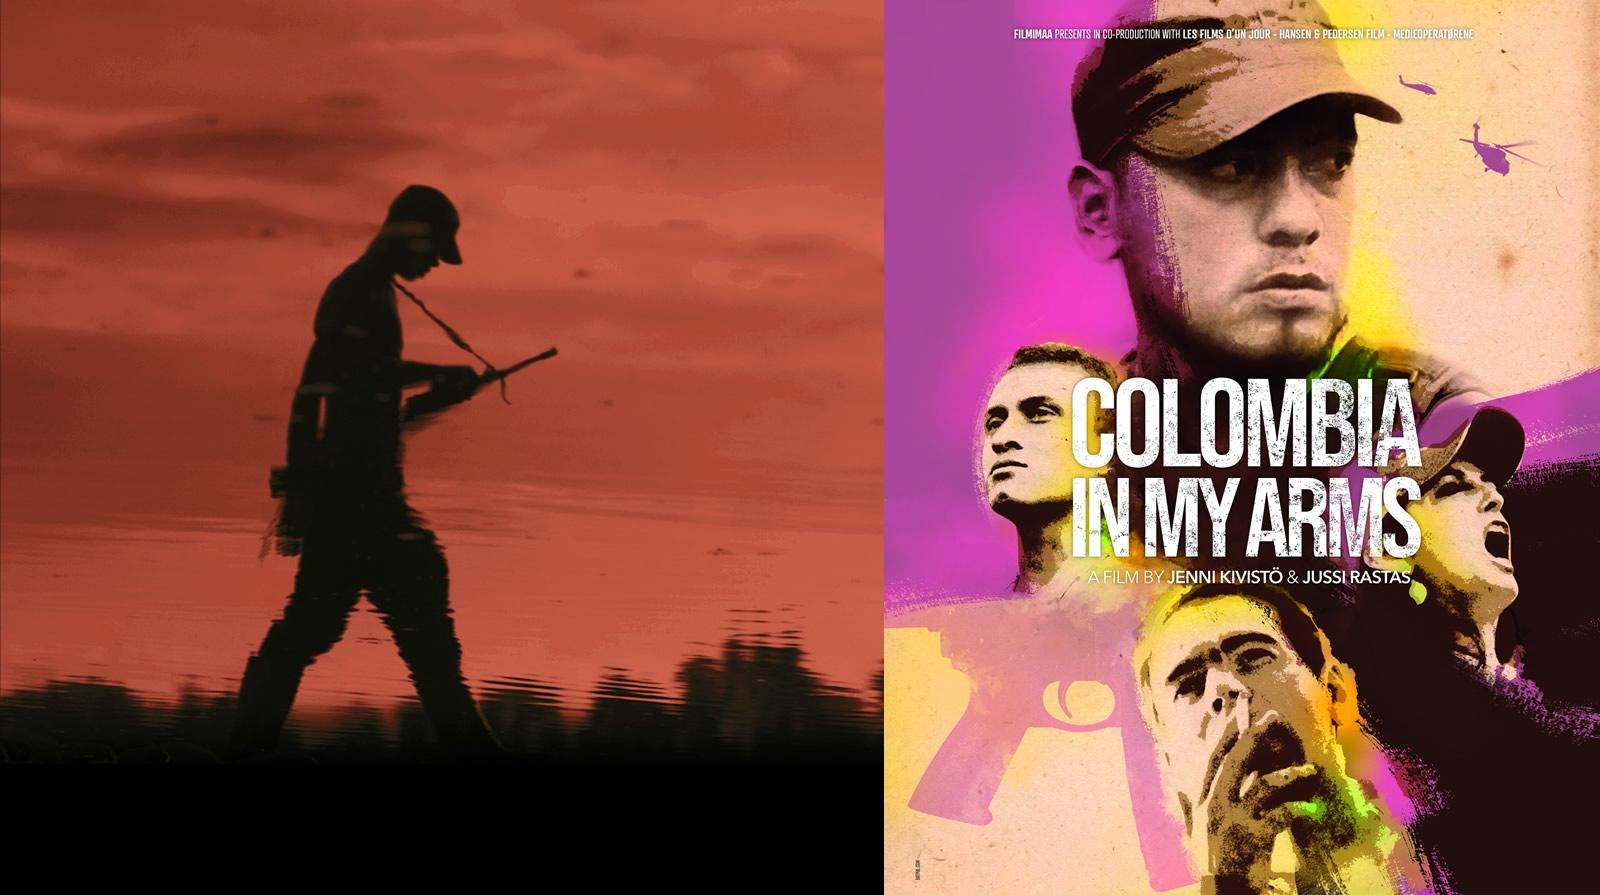 Colombia in My Arms   Longa documental tem estreia na Mostra de São Paulo